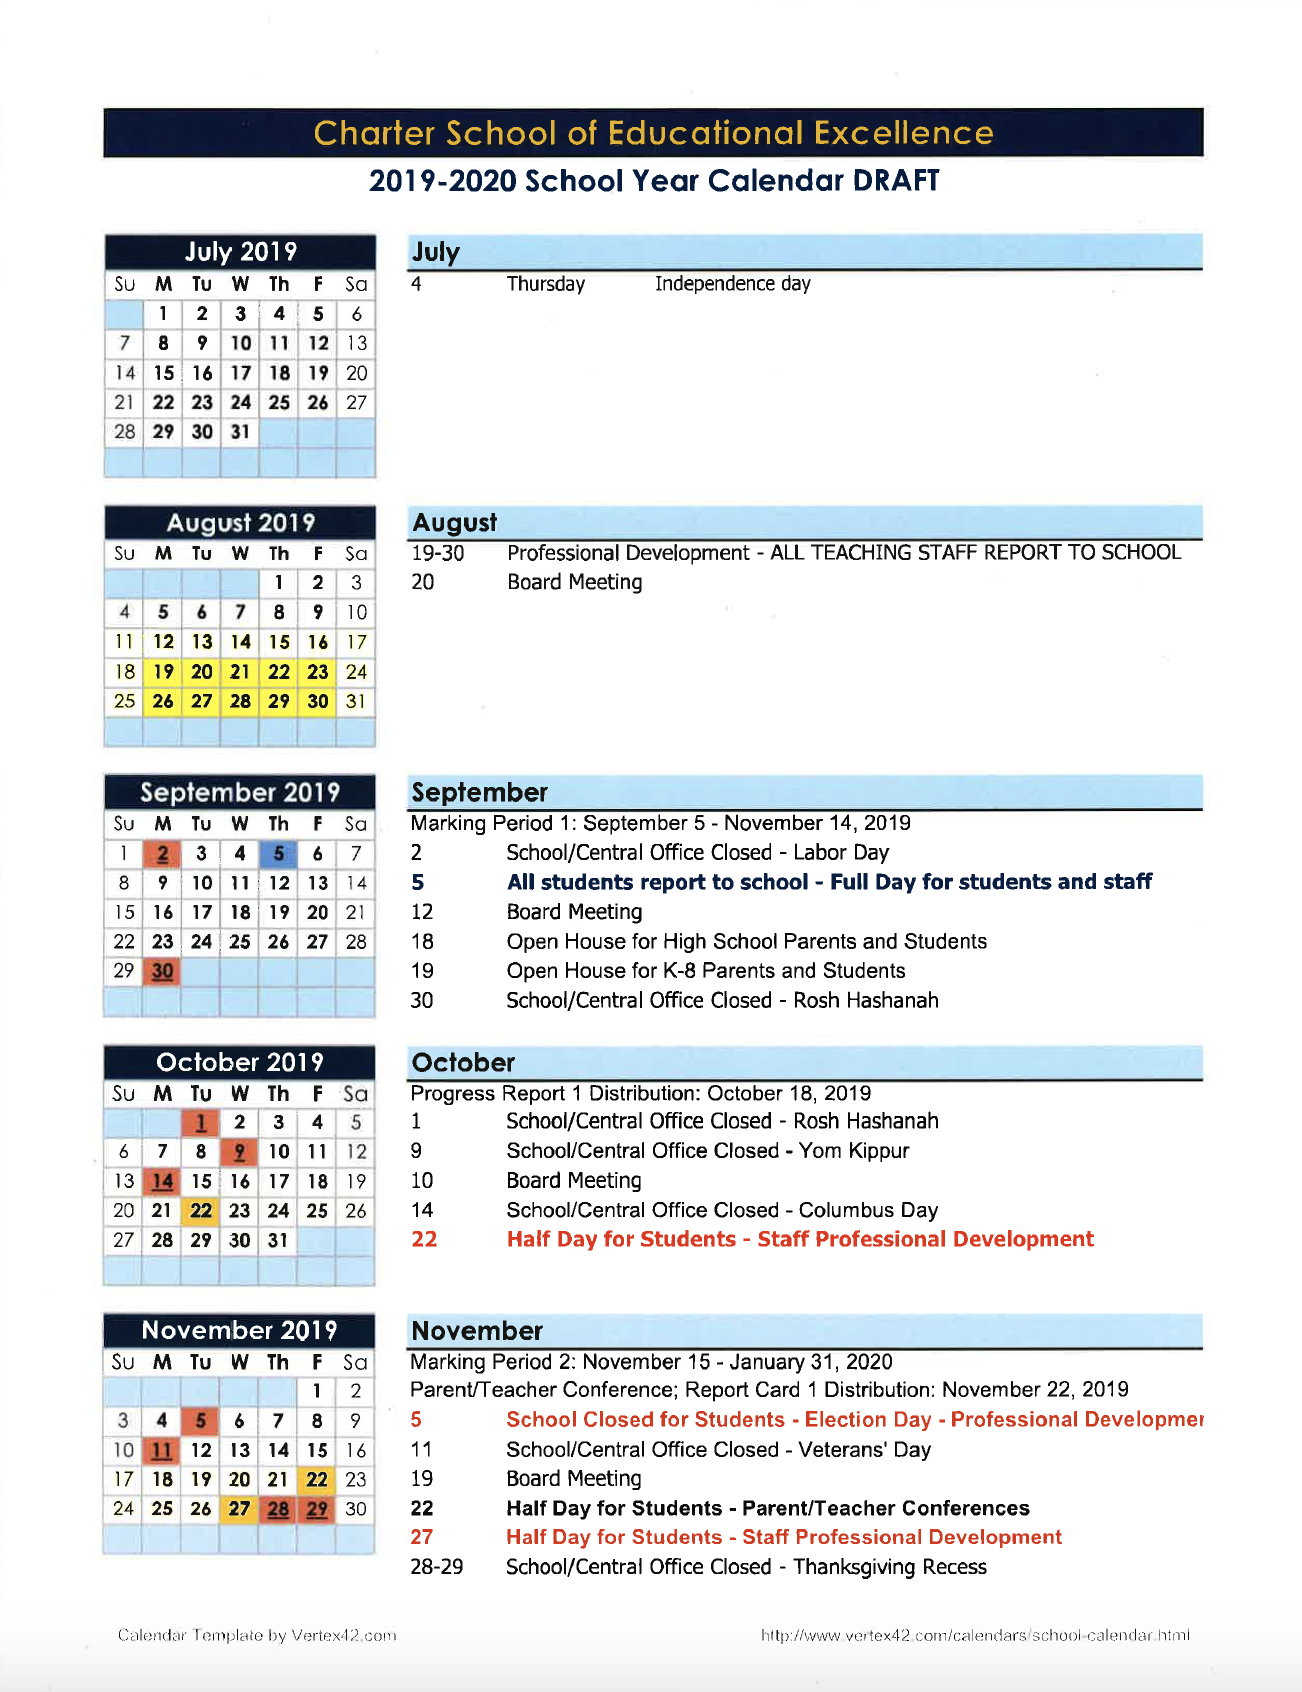 College Of Staten Island Spring 2021 Calendar | Printable Inside Fayette County Georgia School Calendar 2021 20